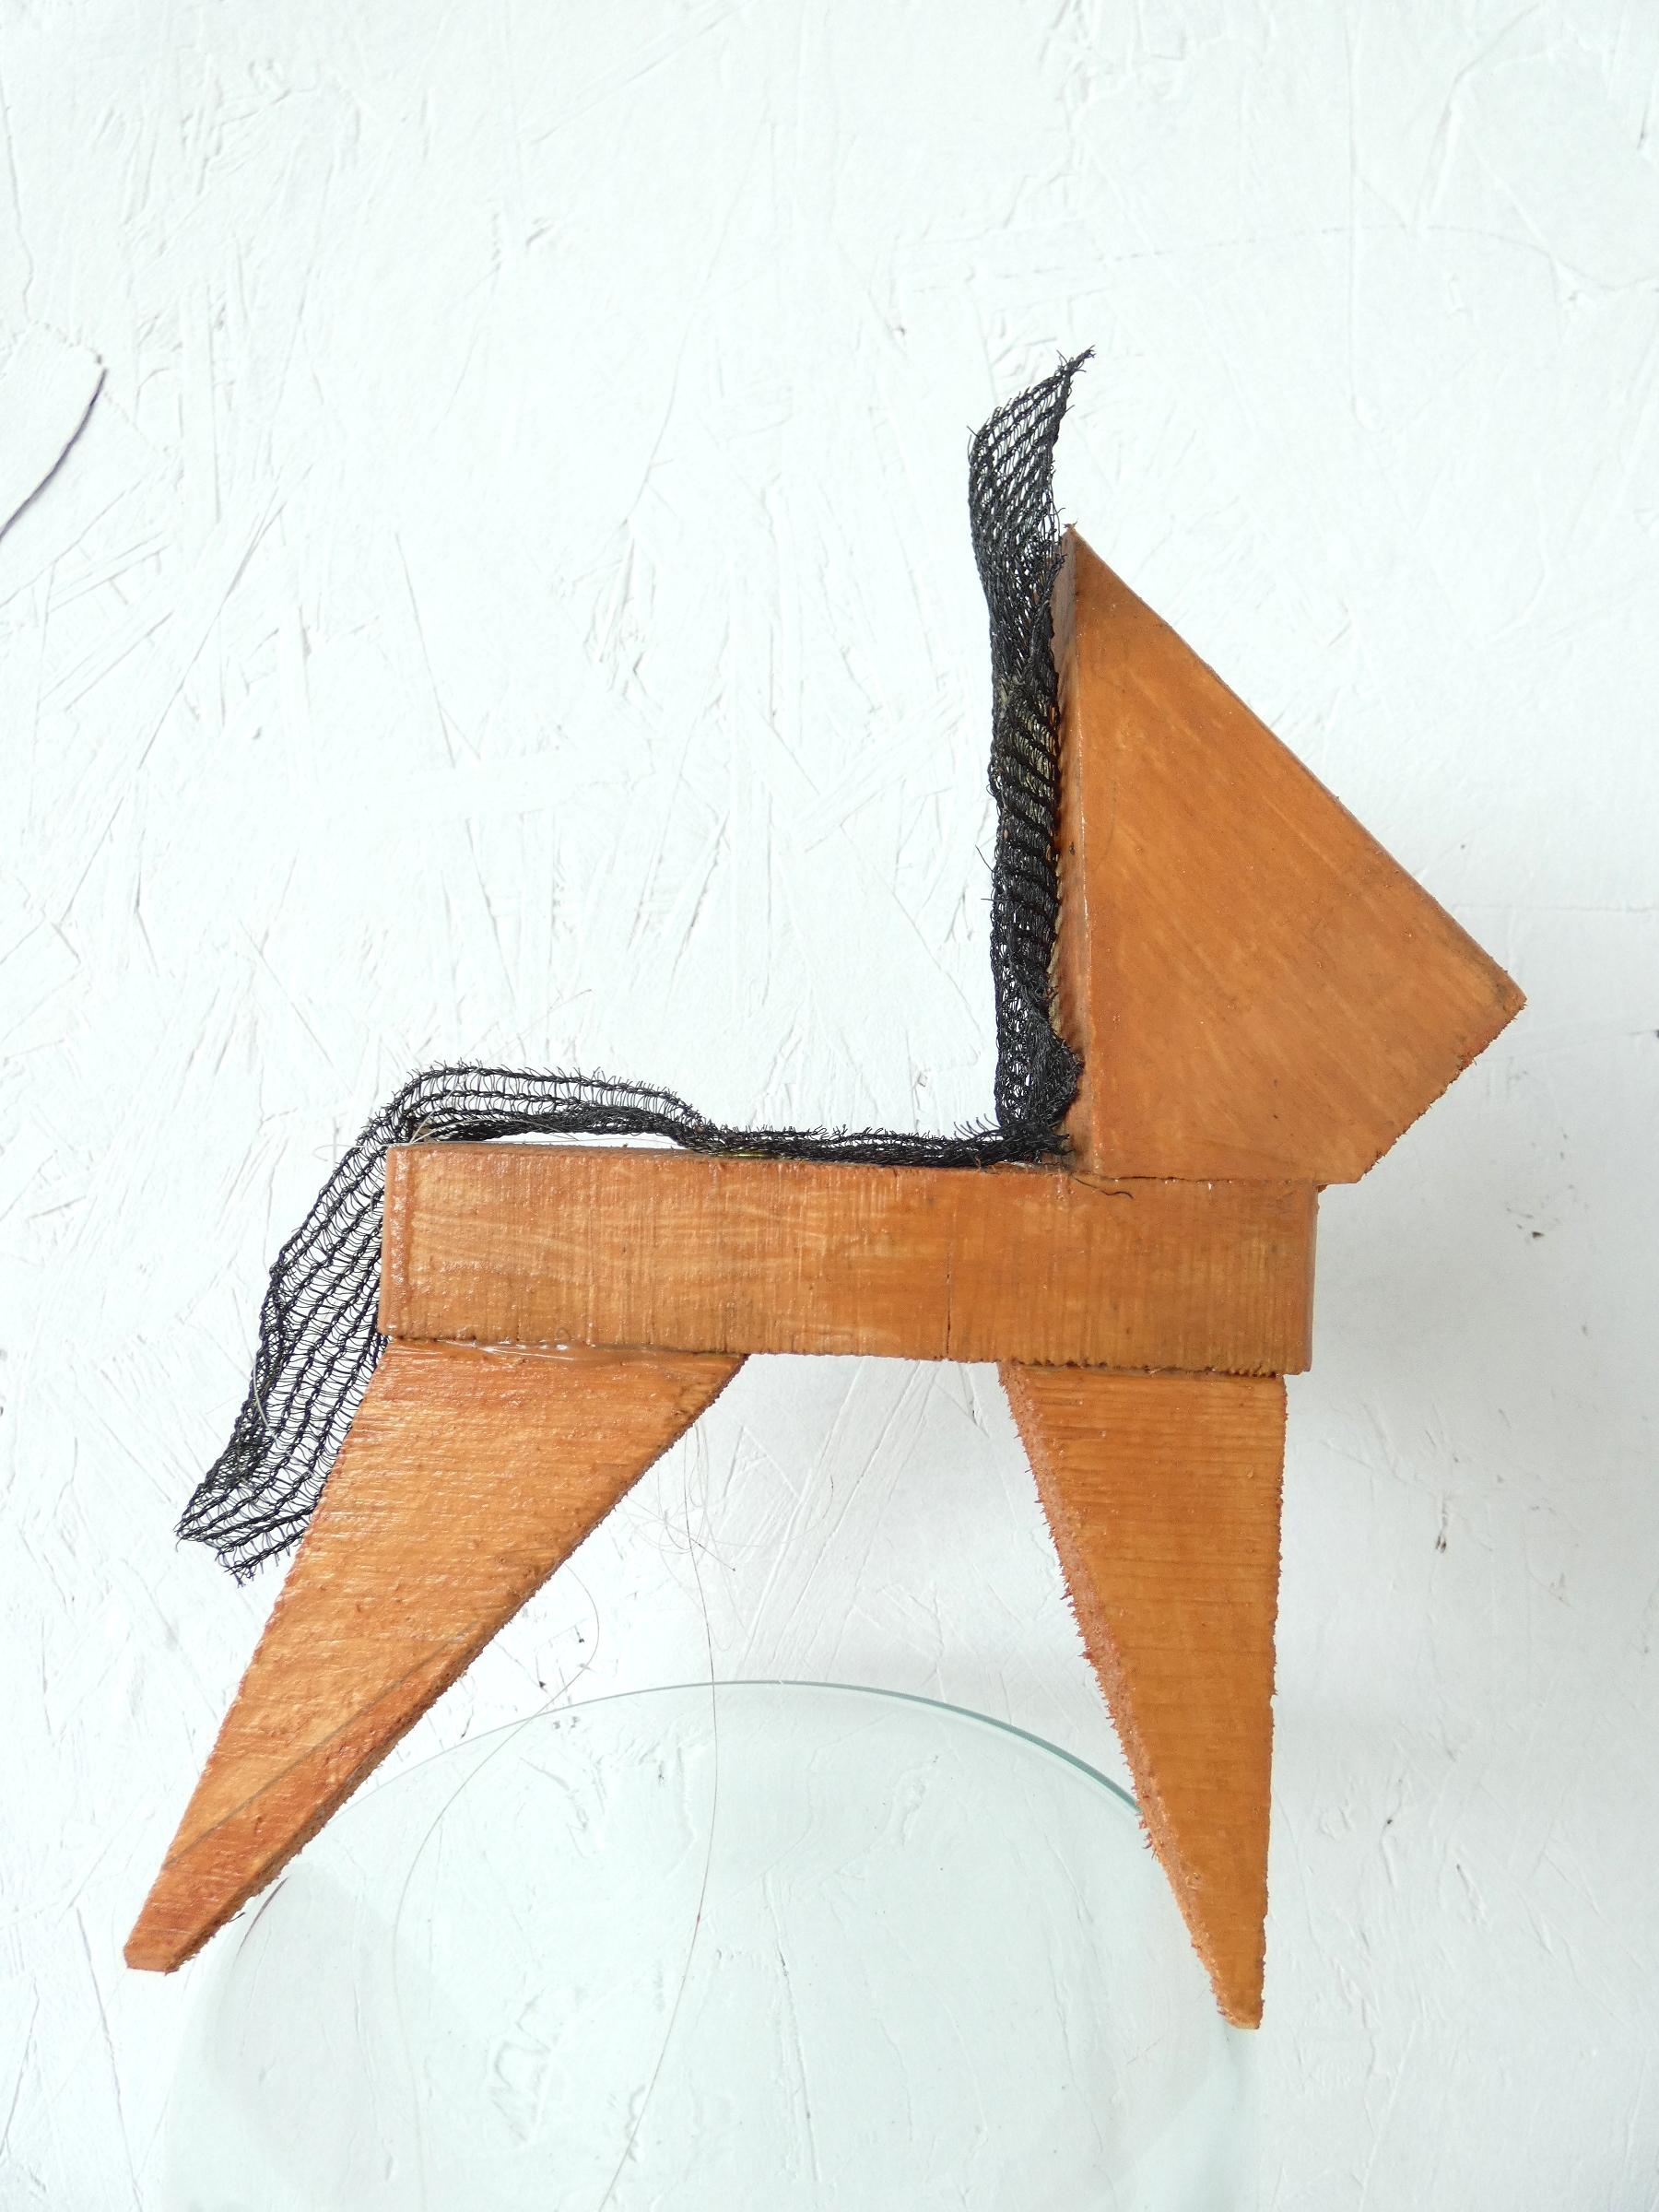 Trots paardje object, proud horse, paardenhaar, artwork, kunst, art, artlovers, hout, kunst kopen, artcollectors, sculpture, art at home, kunst in huis, kunstenaar Wietske Lycklama à Nijeholt